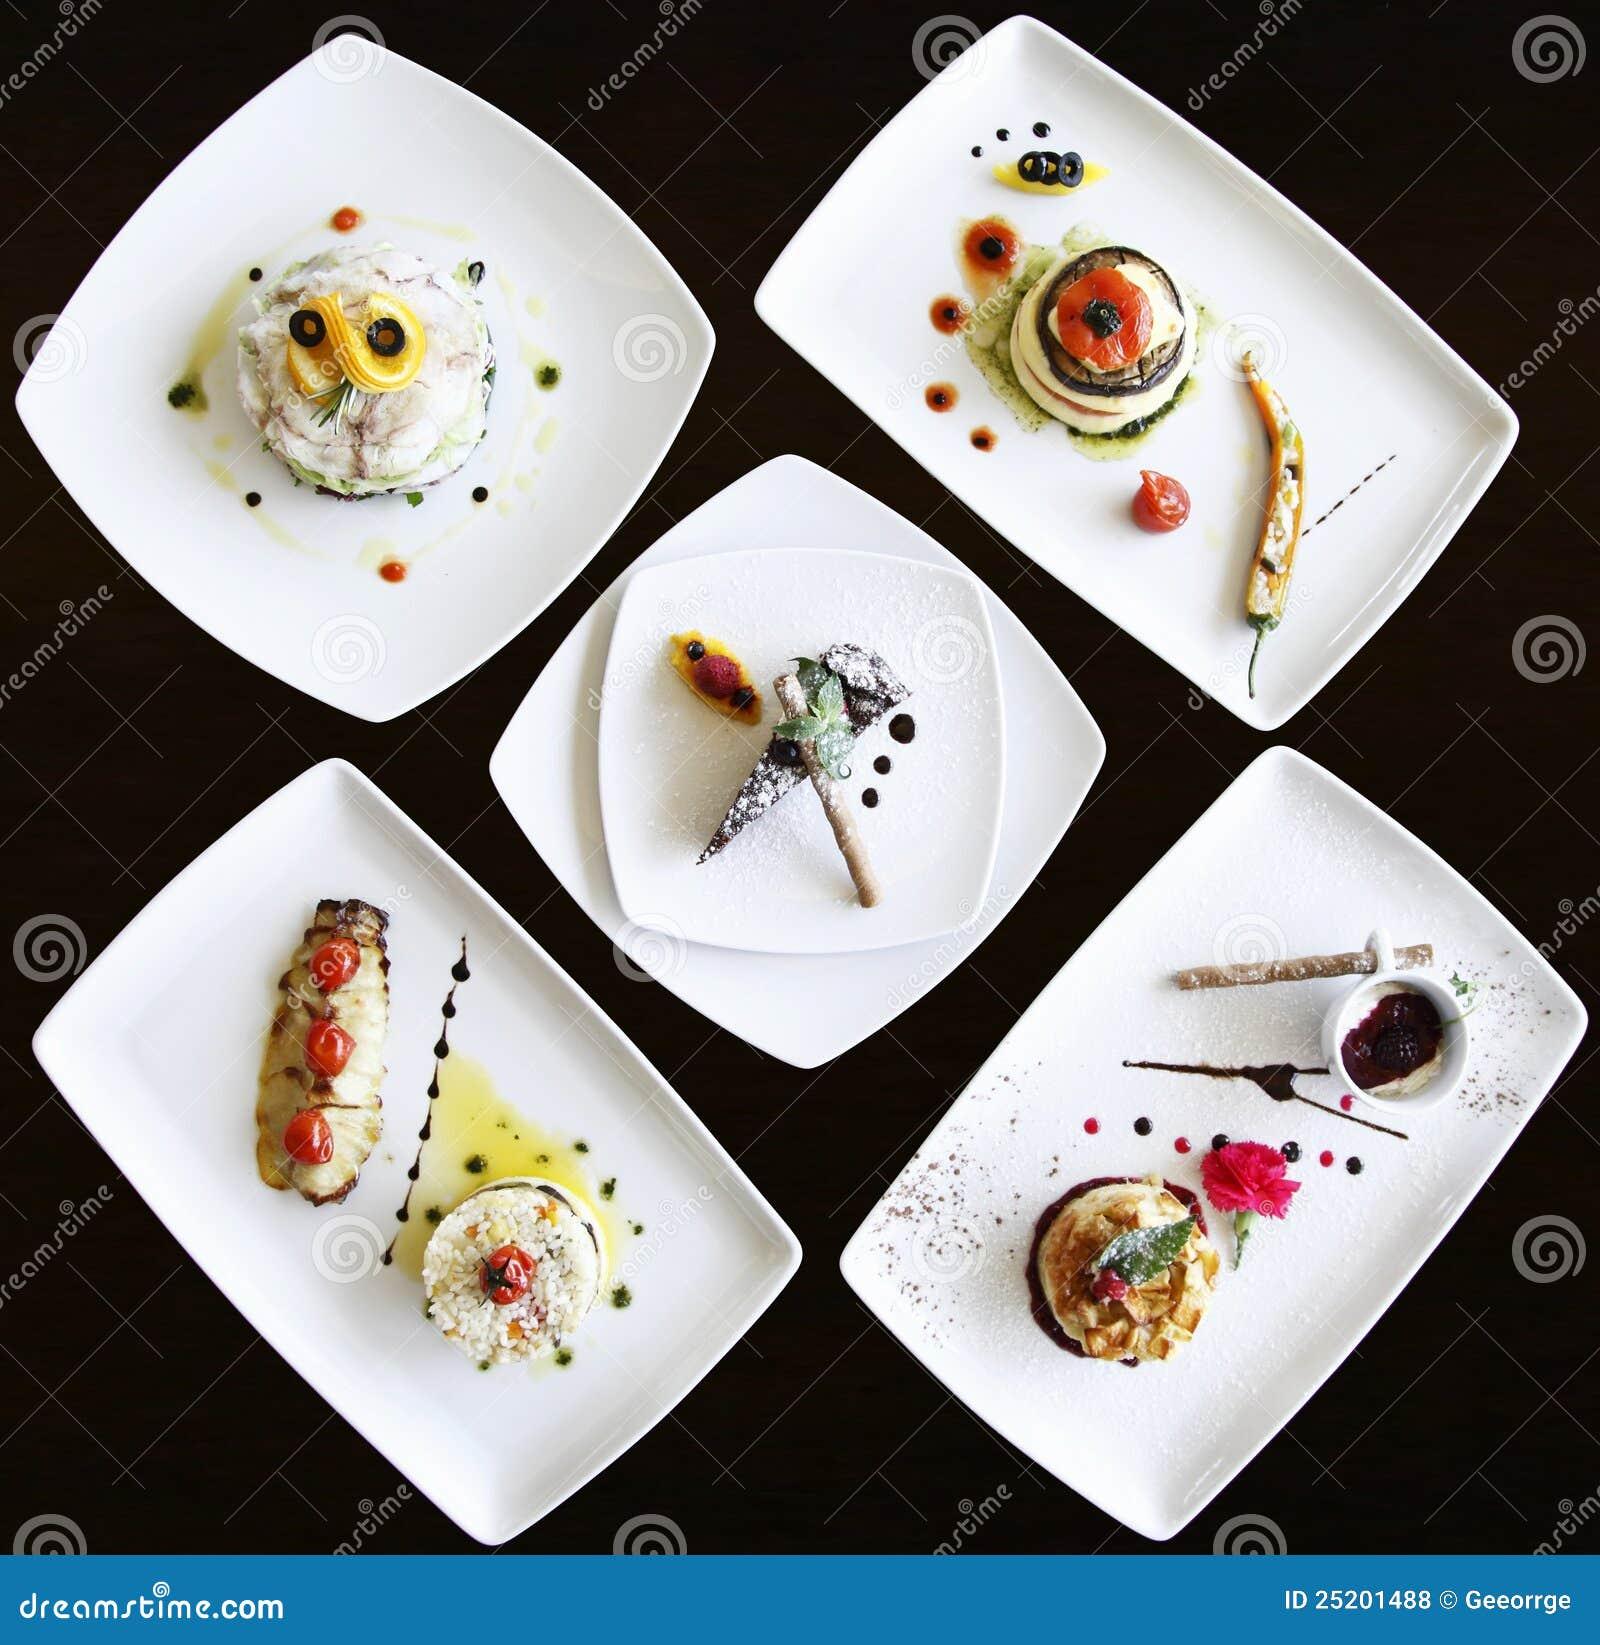 роскошь тарелок подготовила комплект ресторана